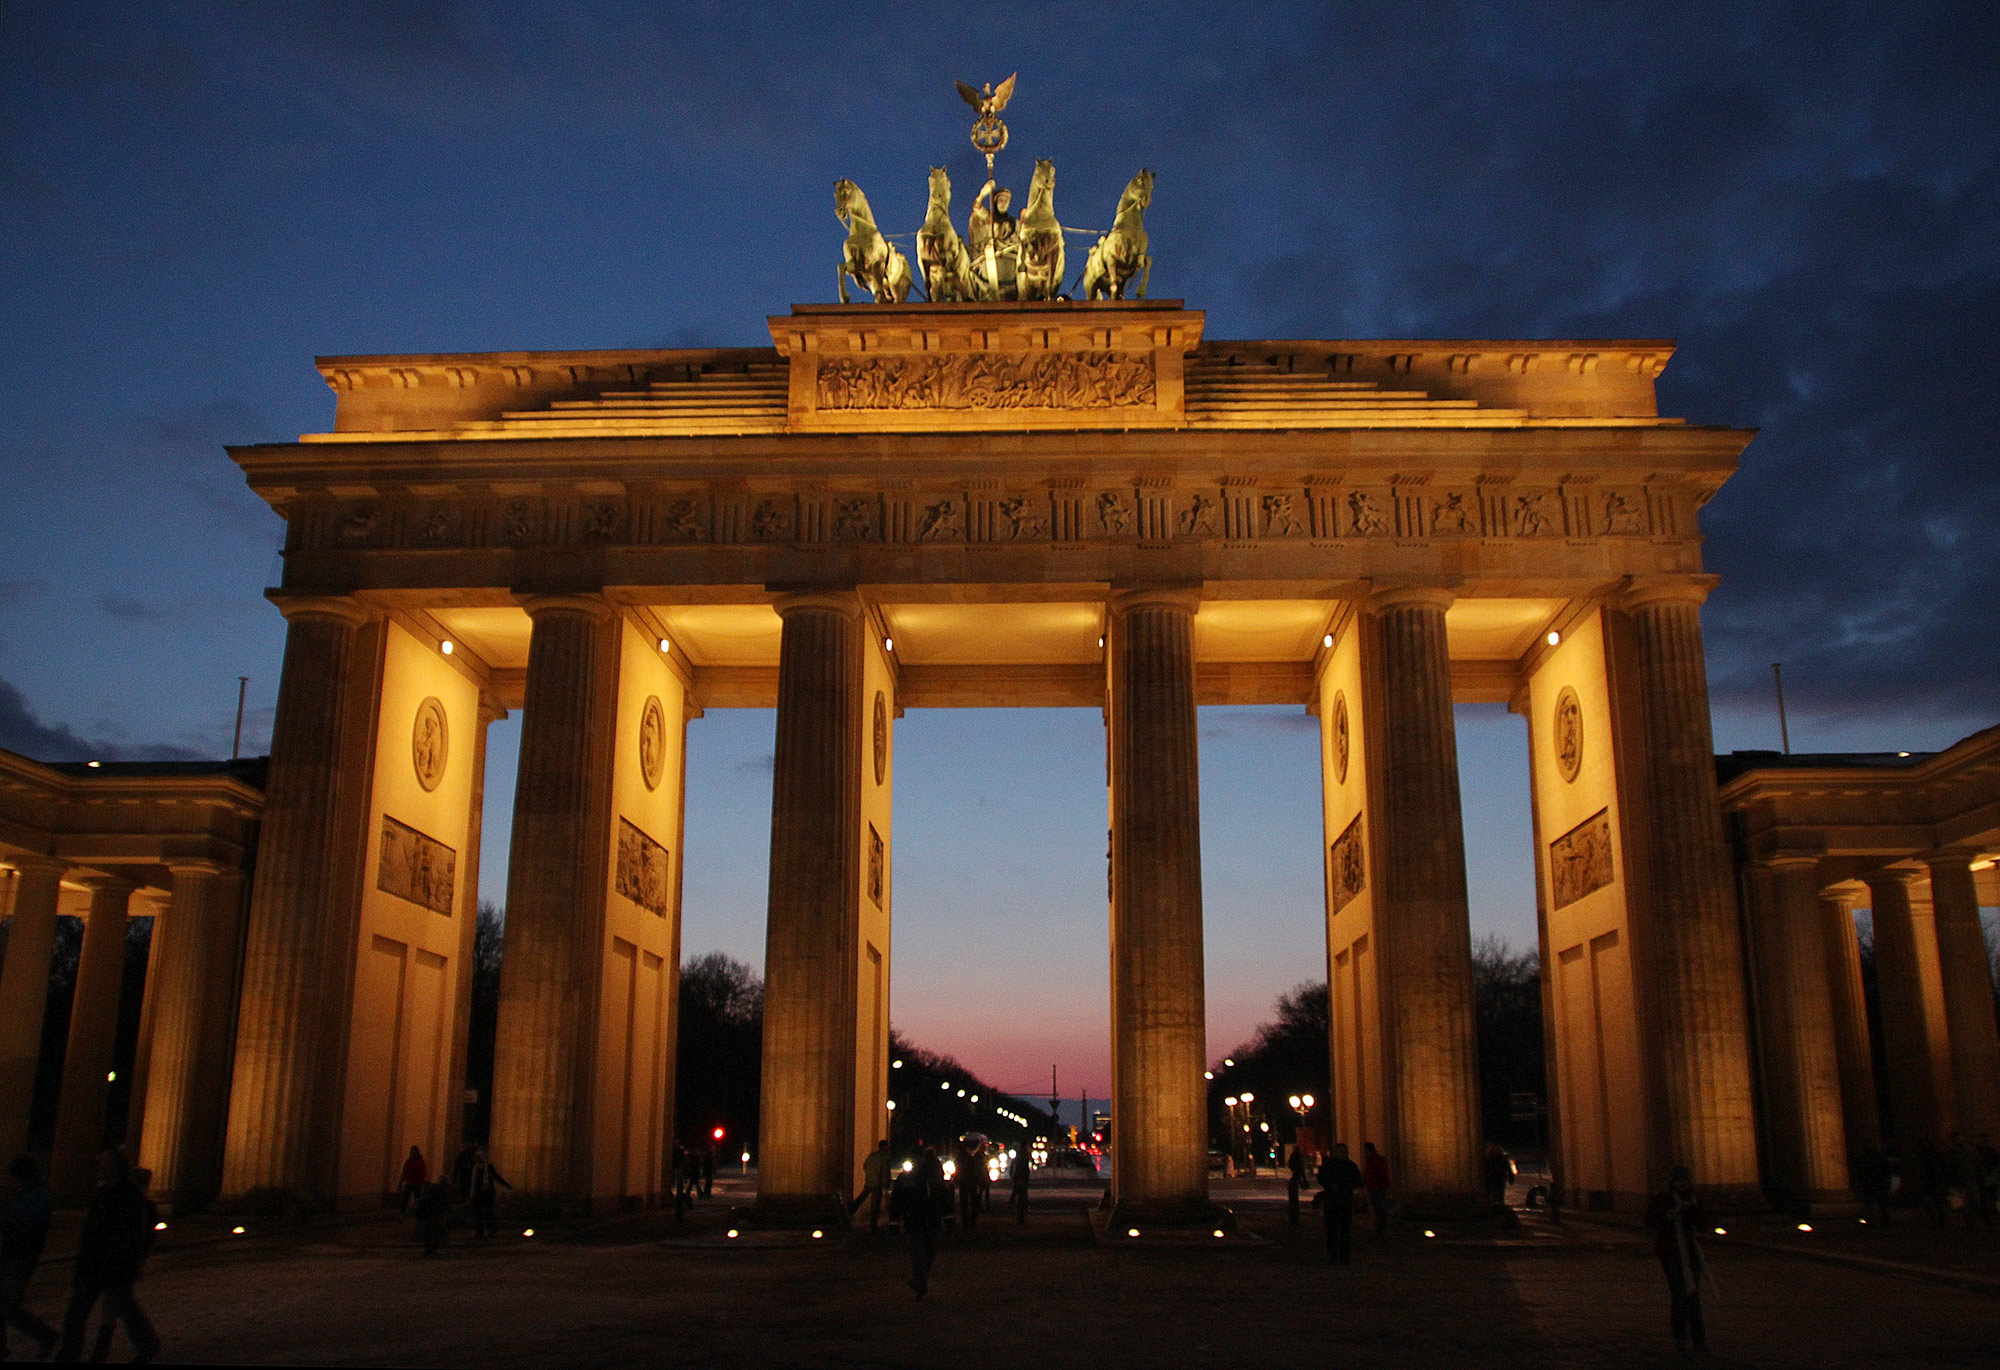 Portal de Brandemburgo - Berlim, Alemanha